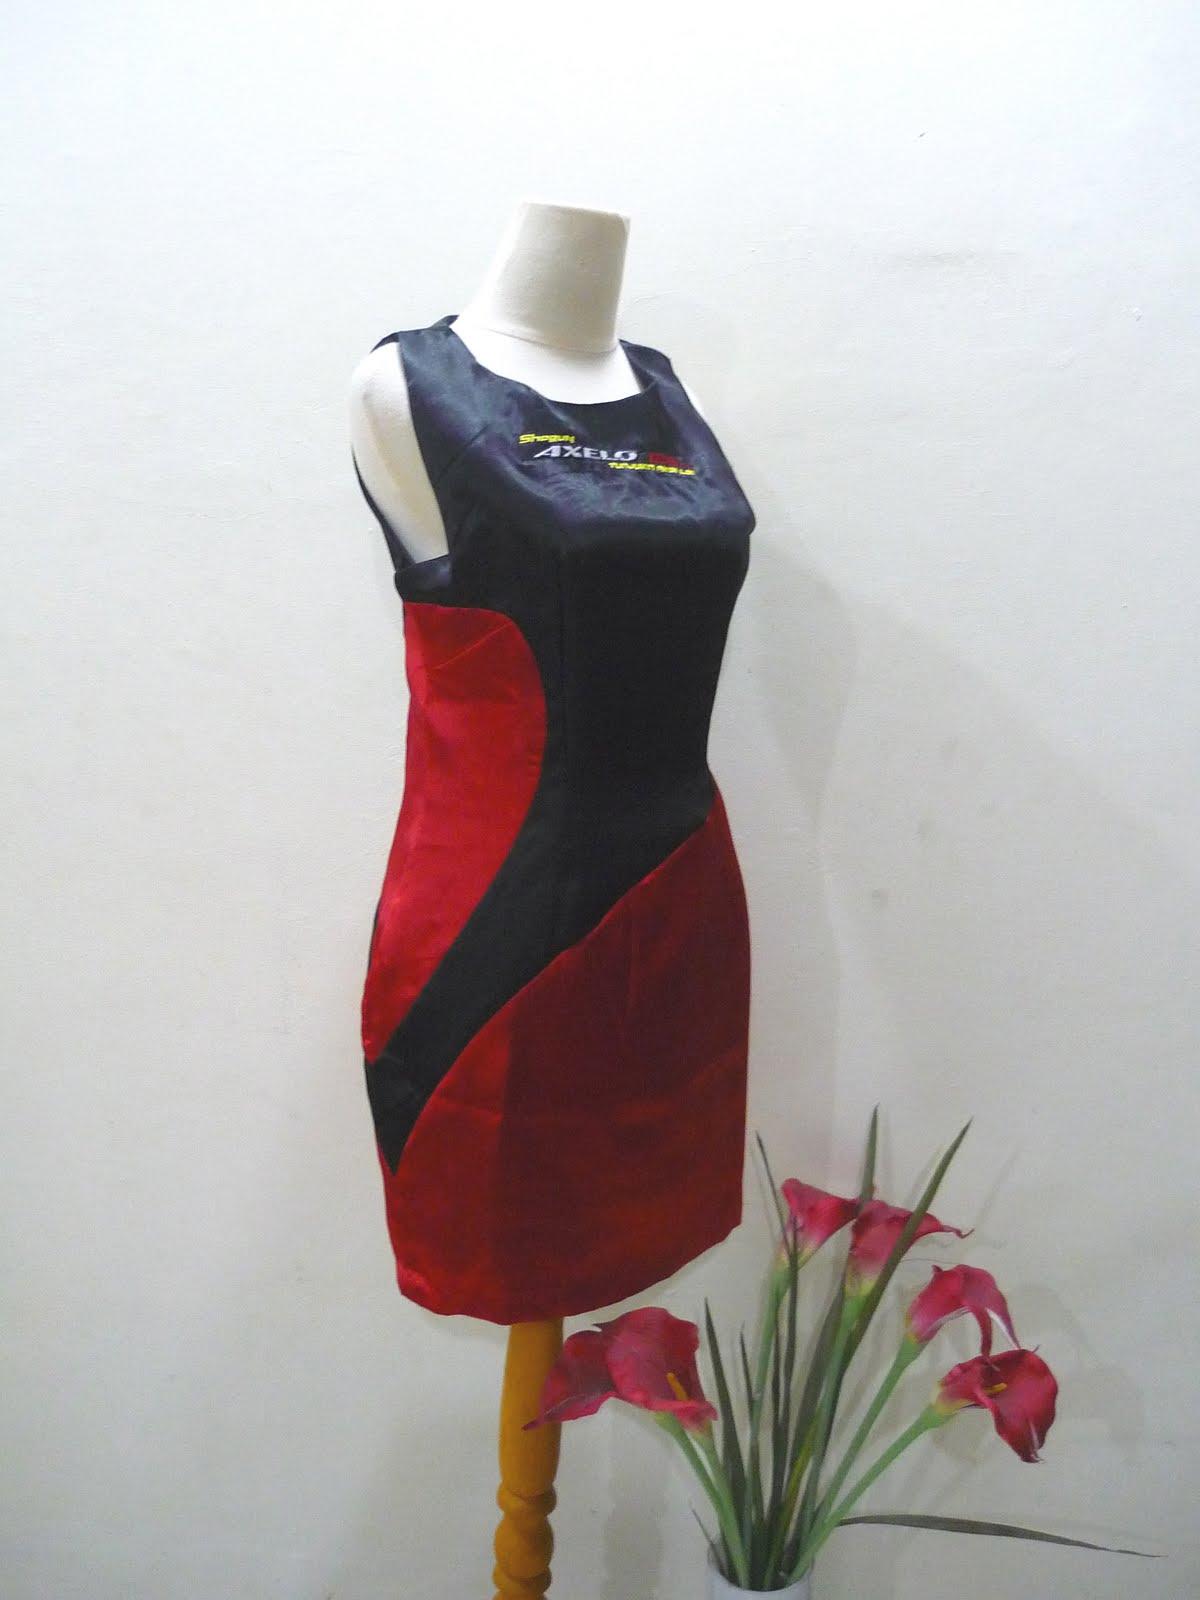 Baju SPG , Seragam SPG, Seragam Kantor, Kaos